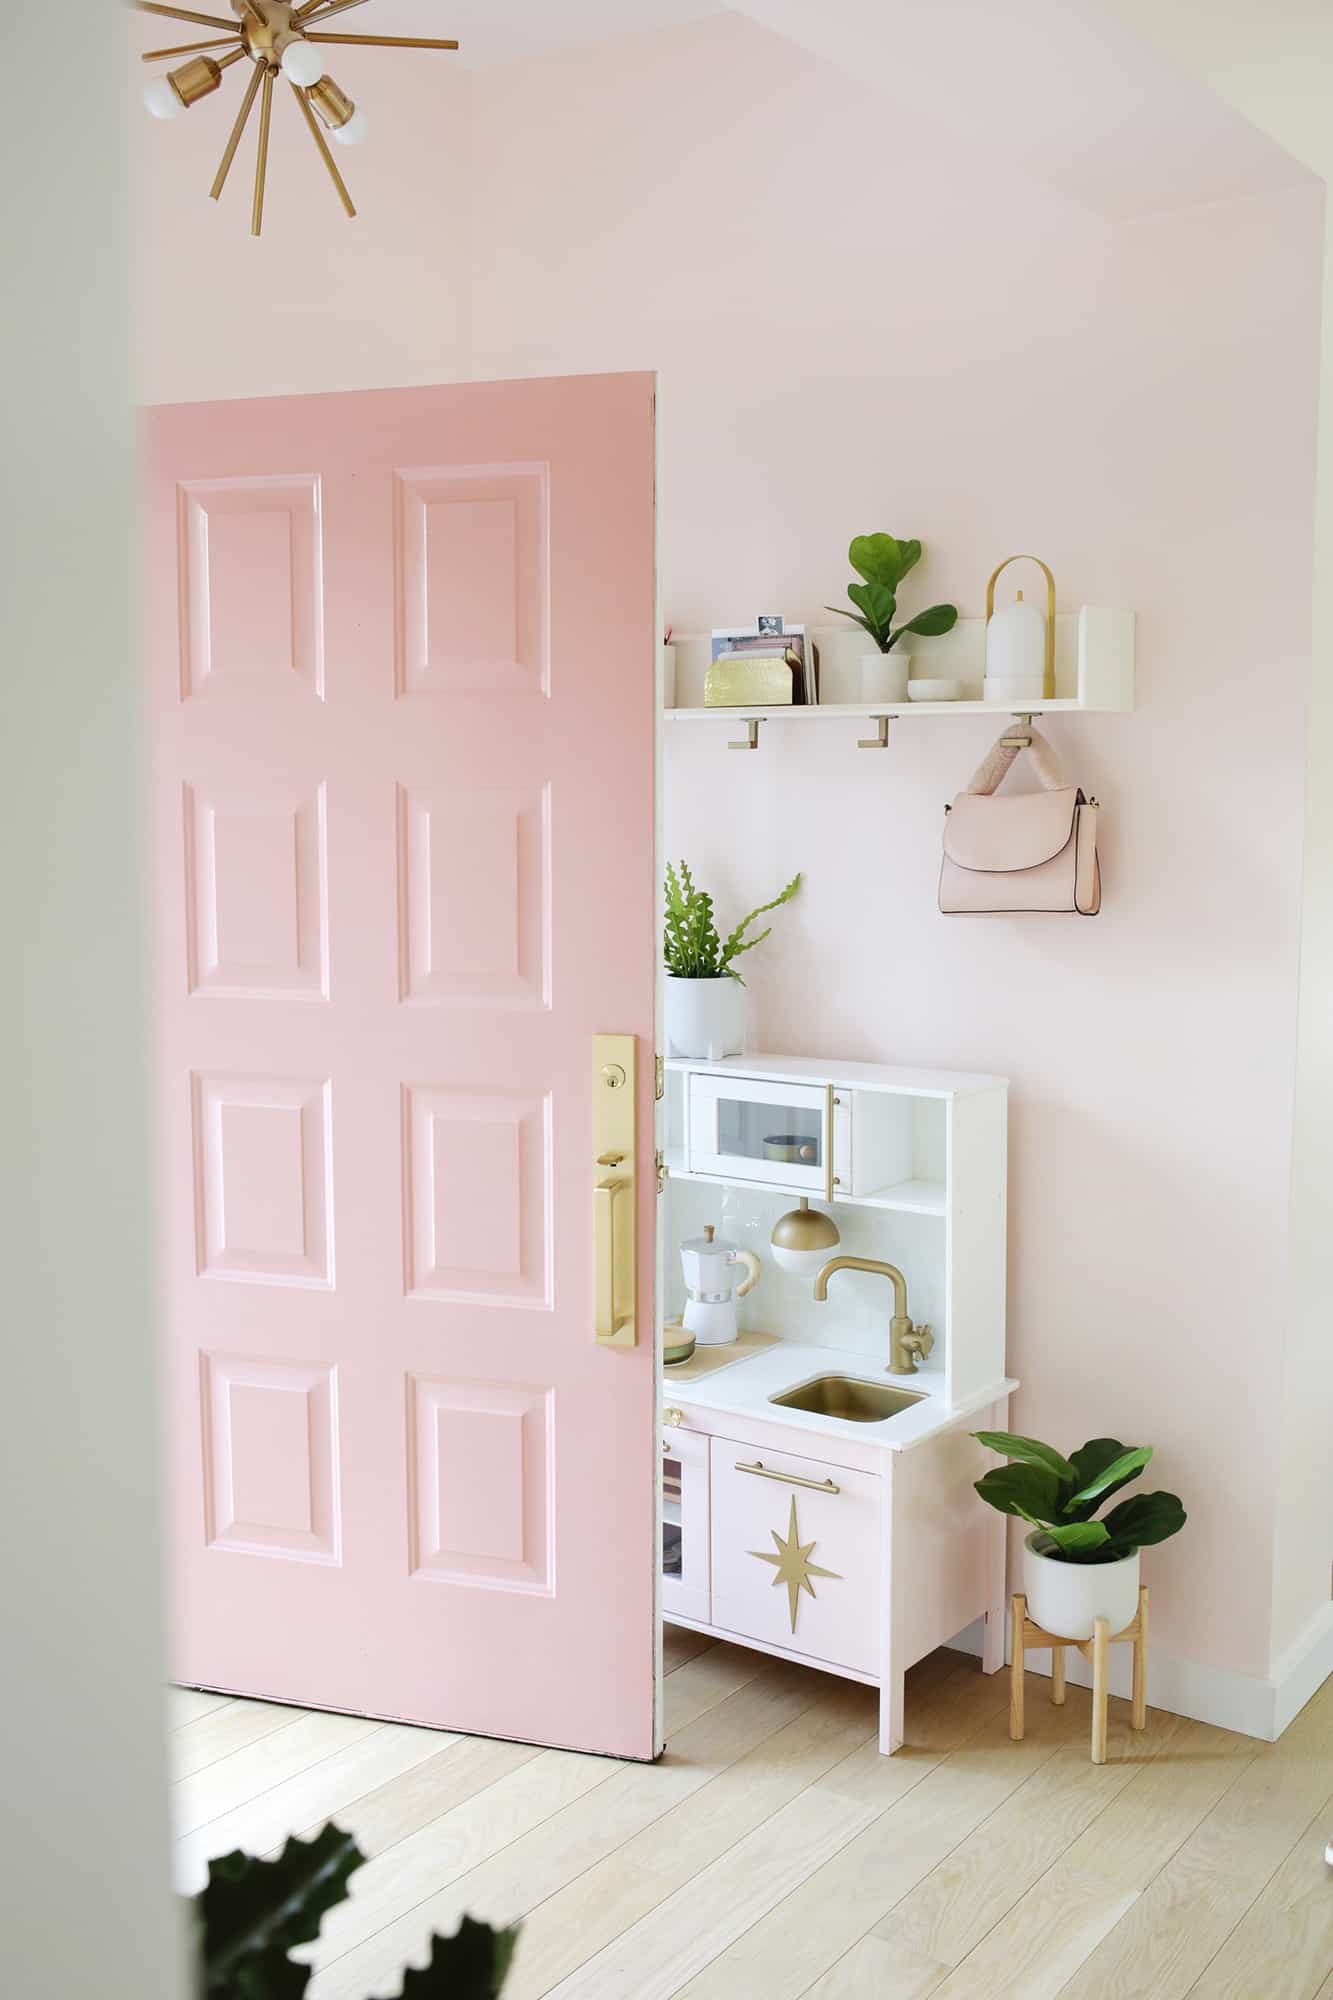 Pink door opening into a pink entryway